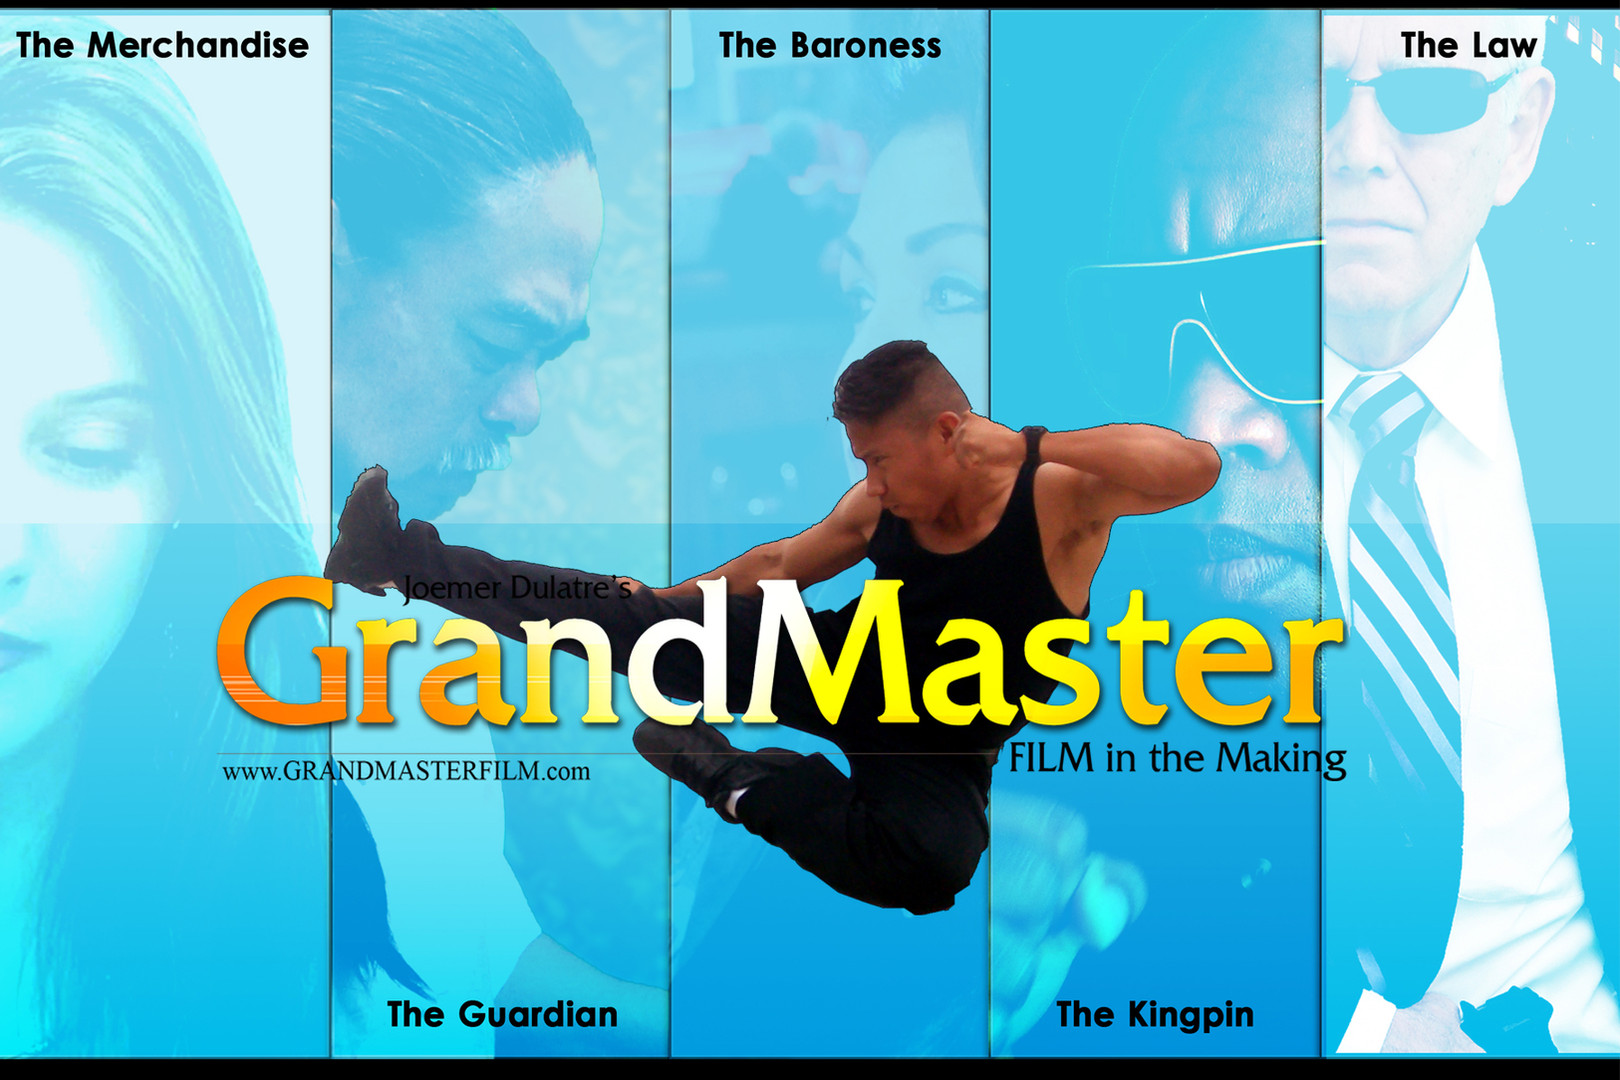 The 5 Stories of GrandMaster